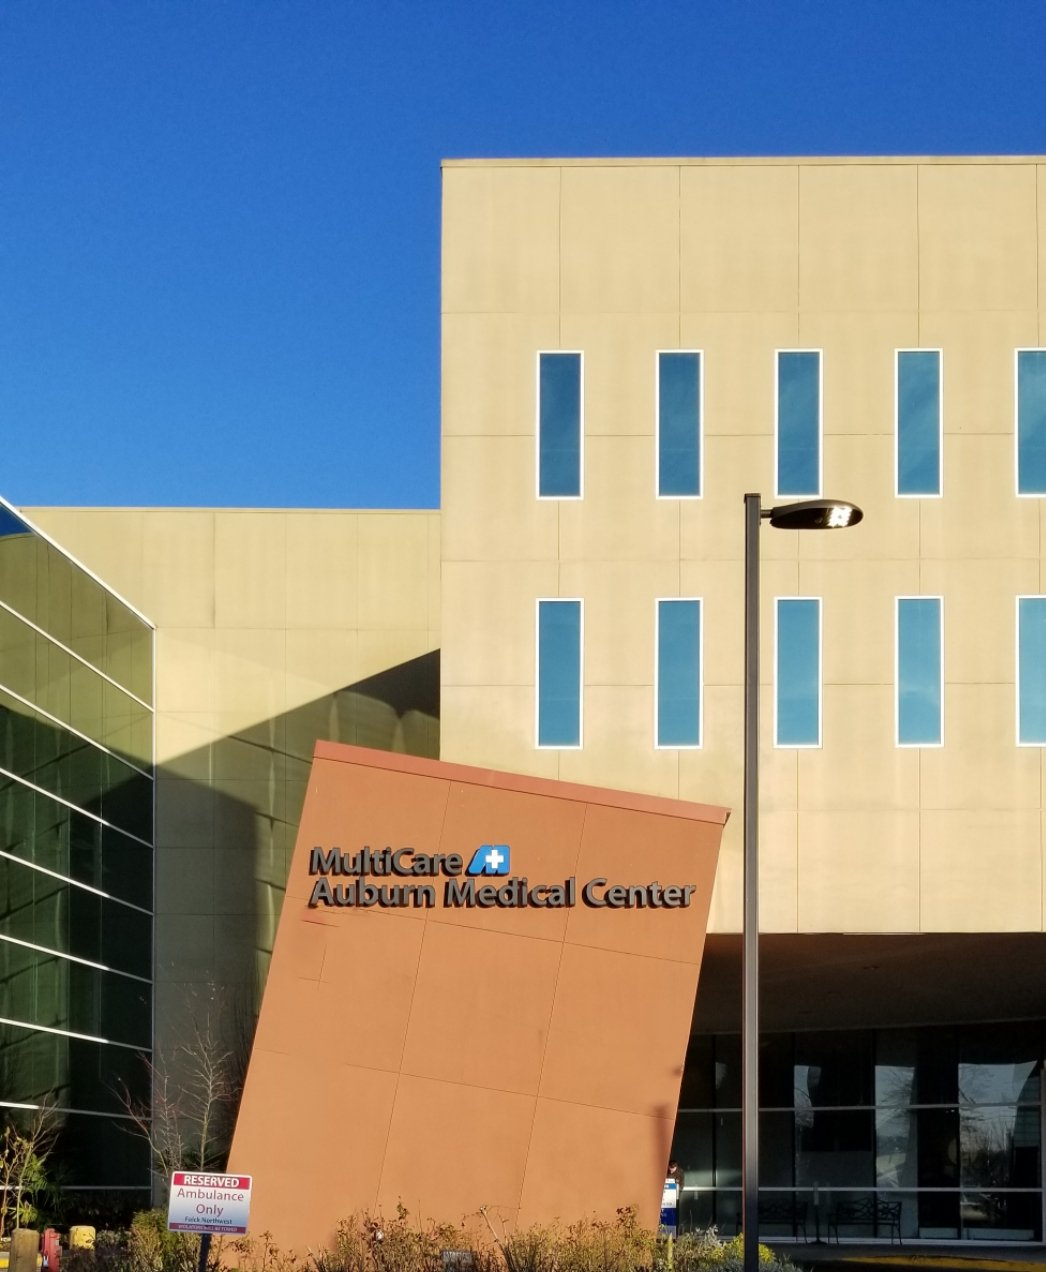 multicare auburn medical center, auburn hospital, auburn wa, city of auburn medical center,